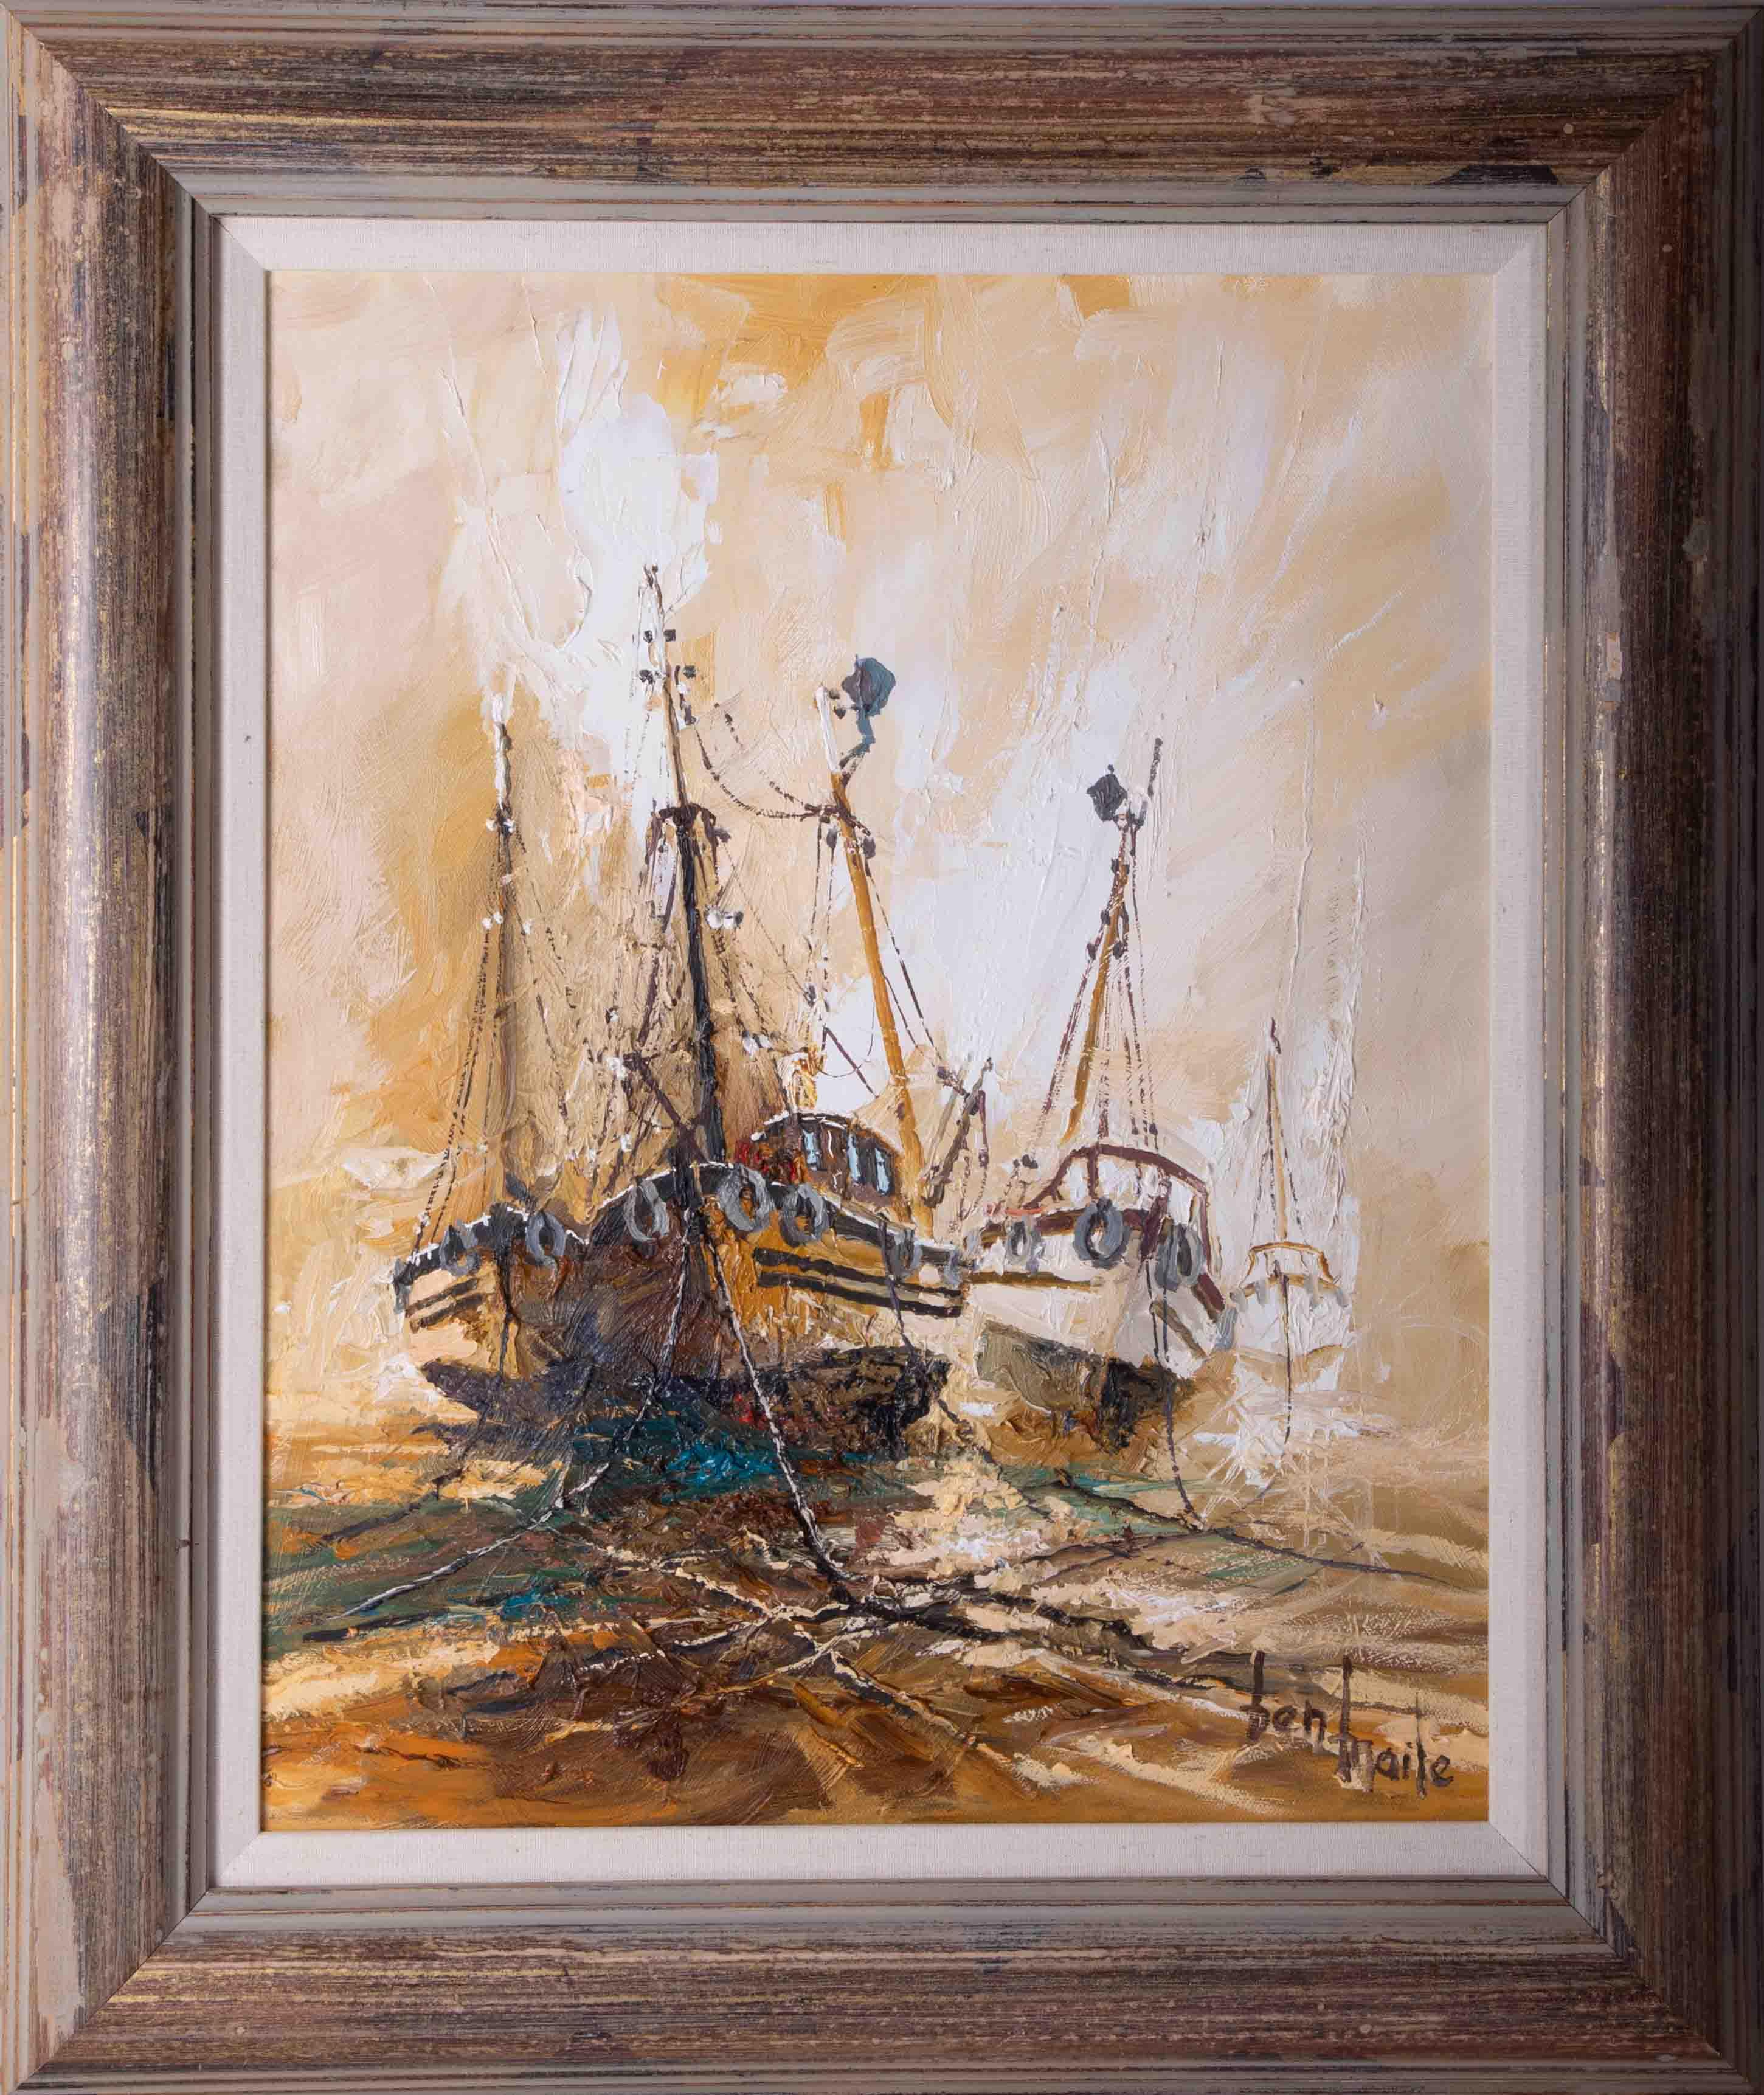 Ben Maile (1922-2017) 'Awaiting The Tide' oil on canvas, signed, 49cm x 38cm, framed.